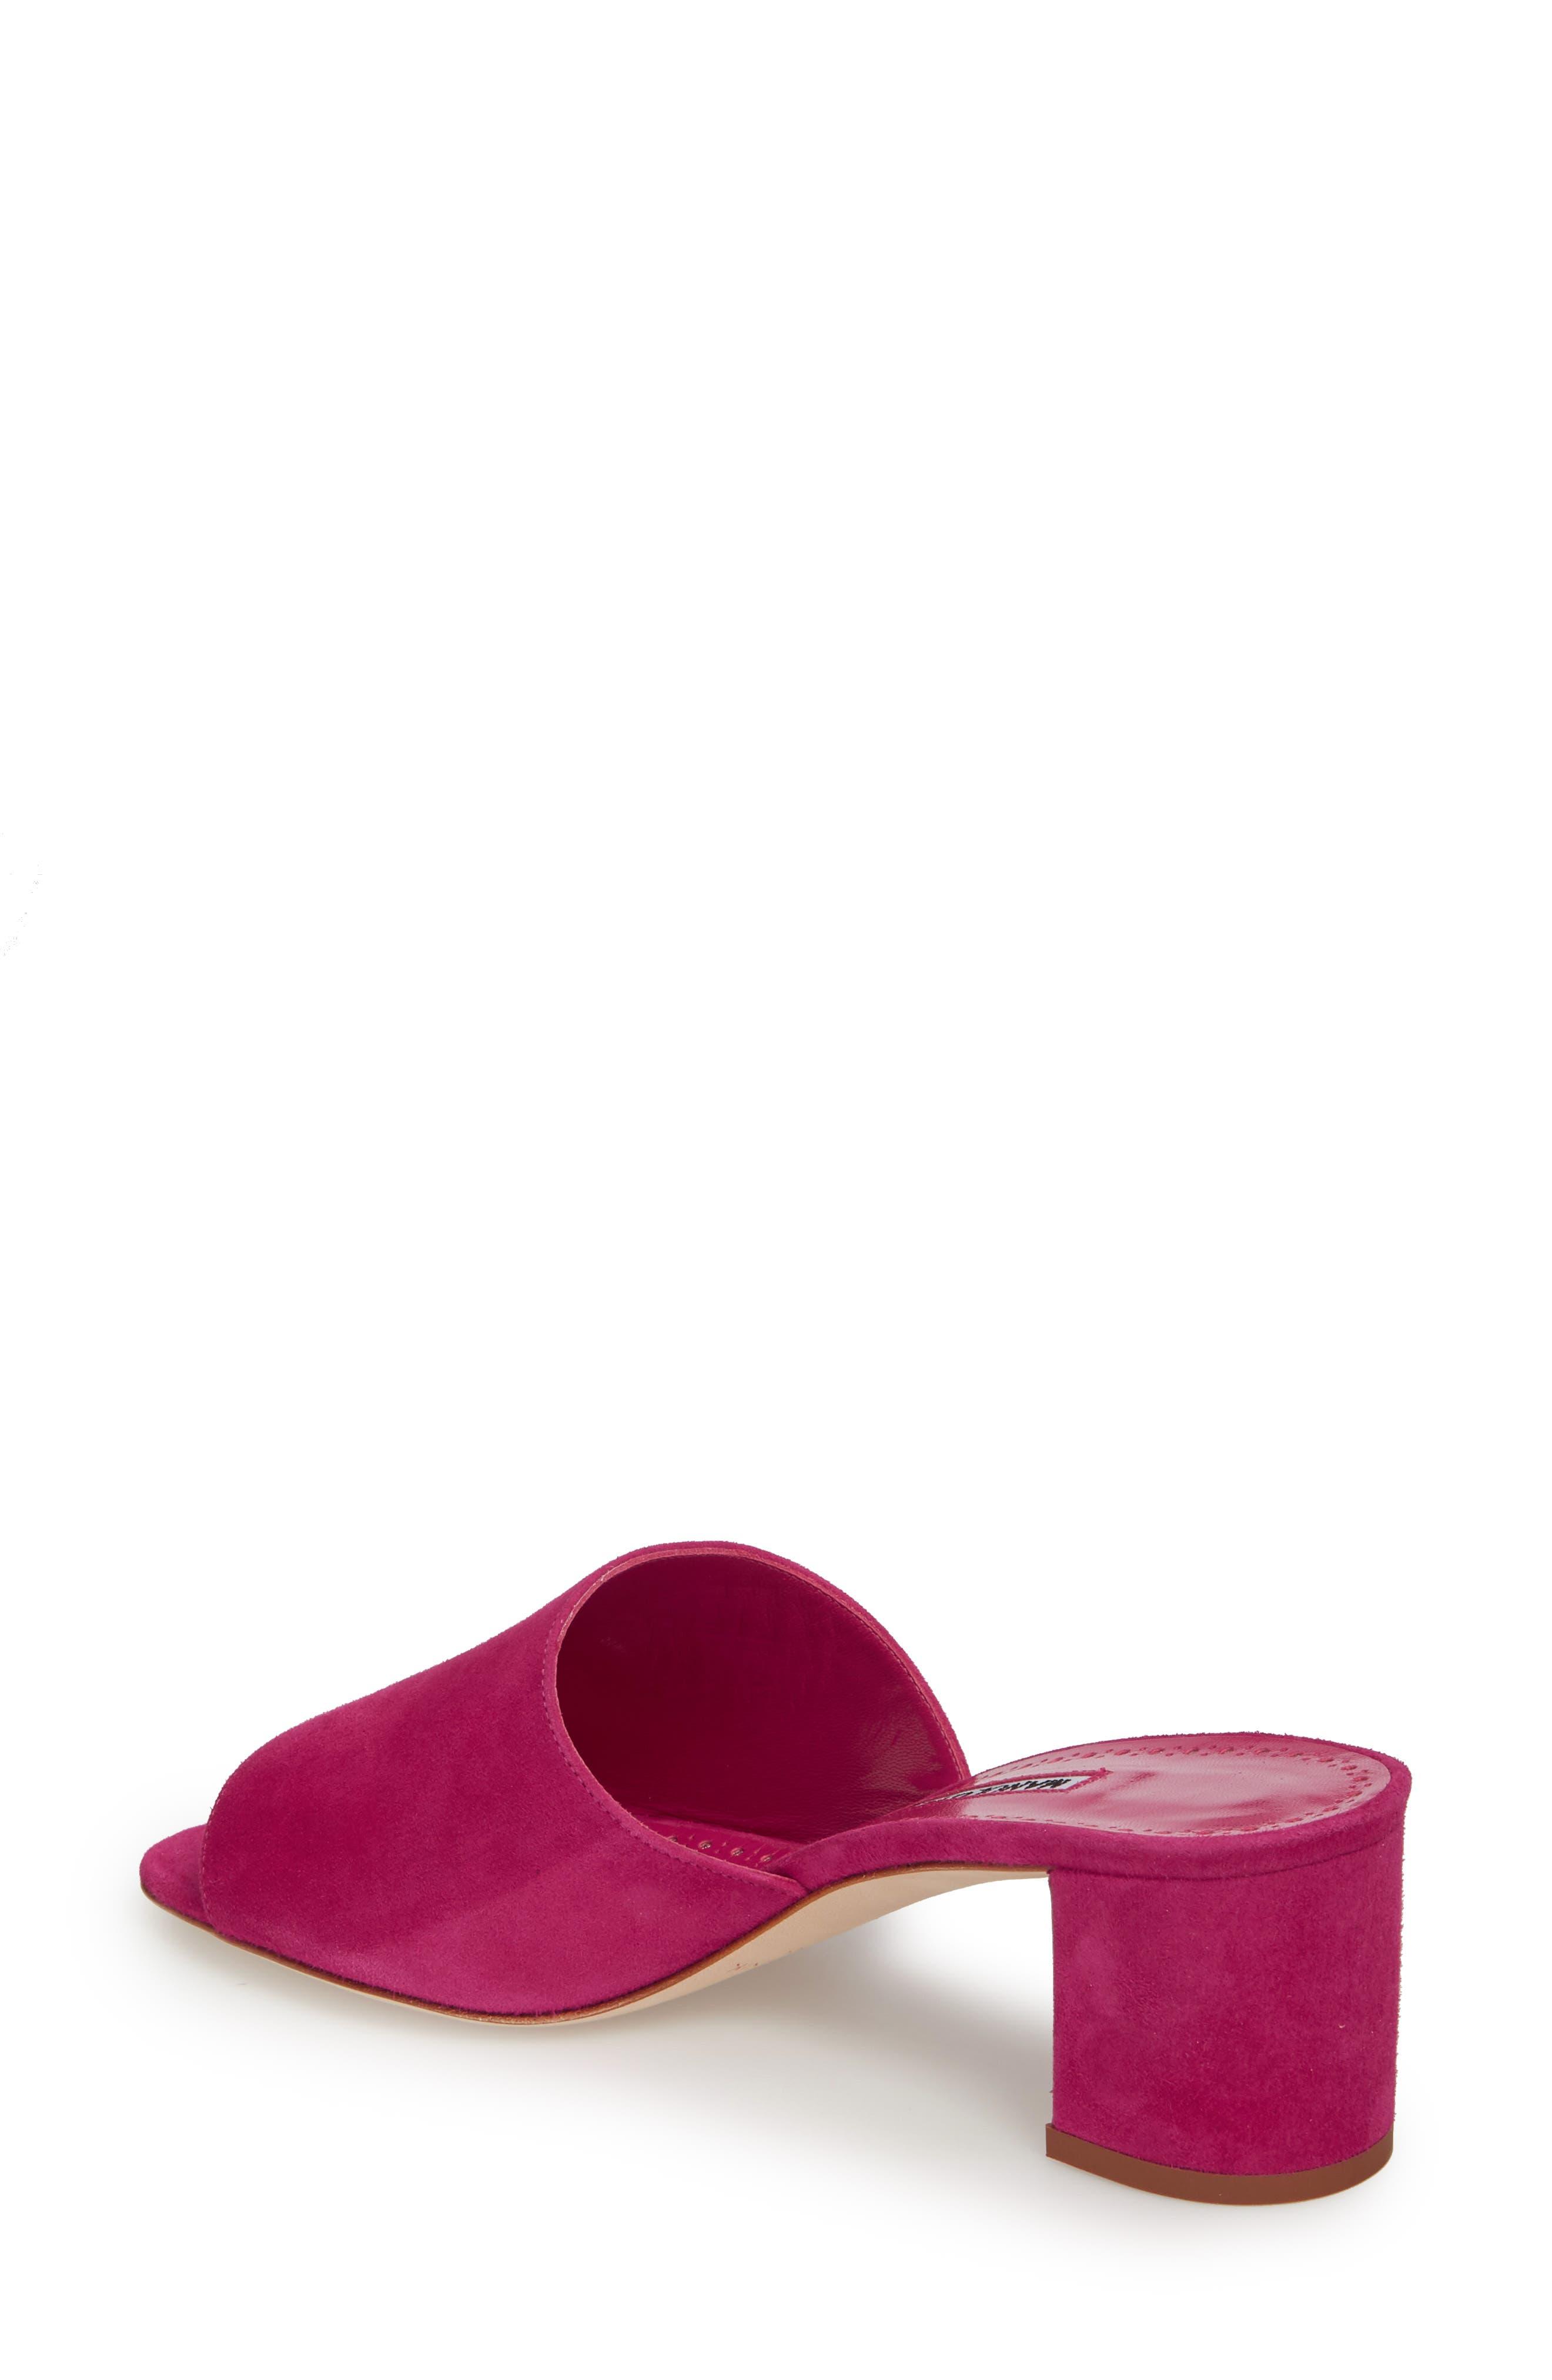 Rapallato Slide Sandal,                             Alternate thumbnail 2, color,                             Fuchsia Suede